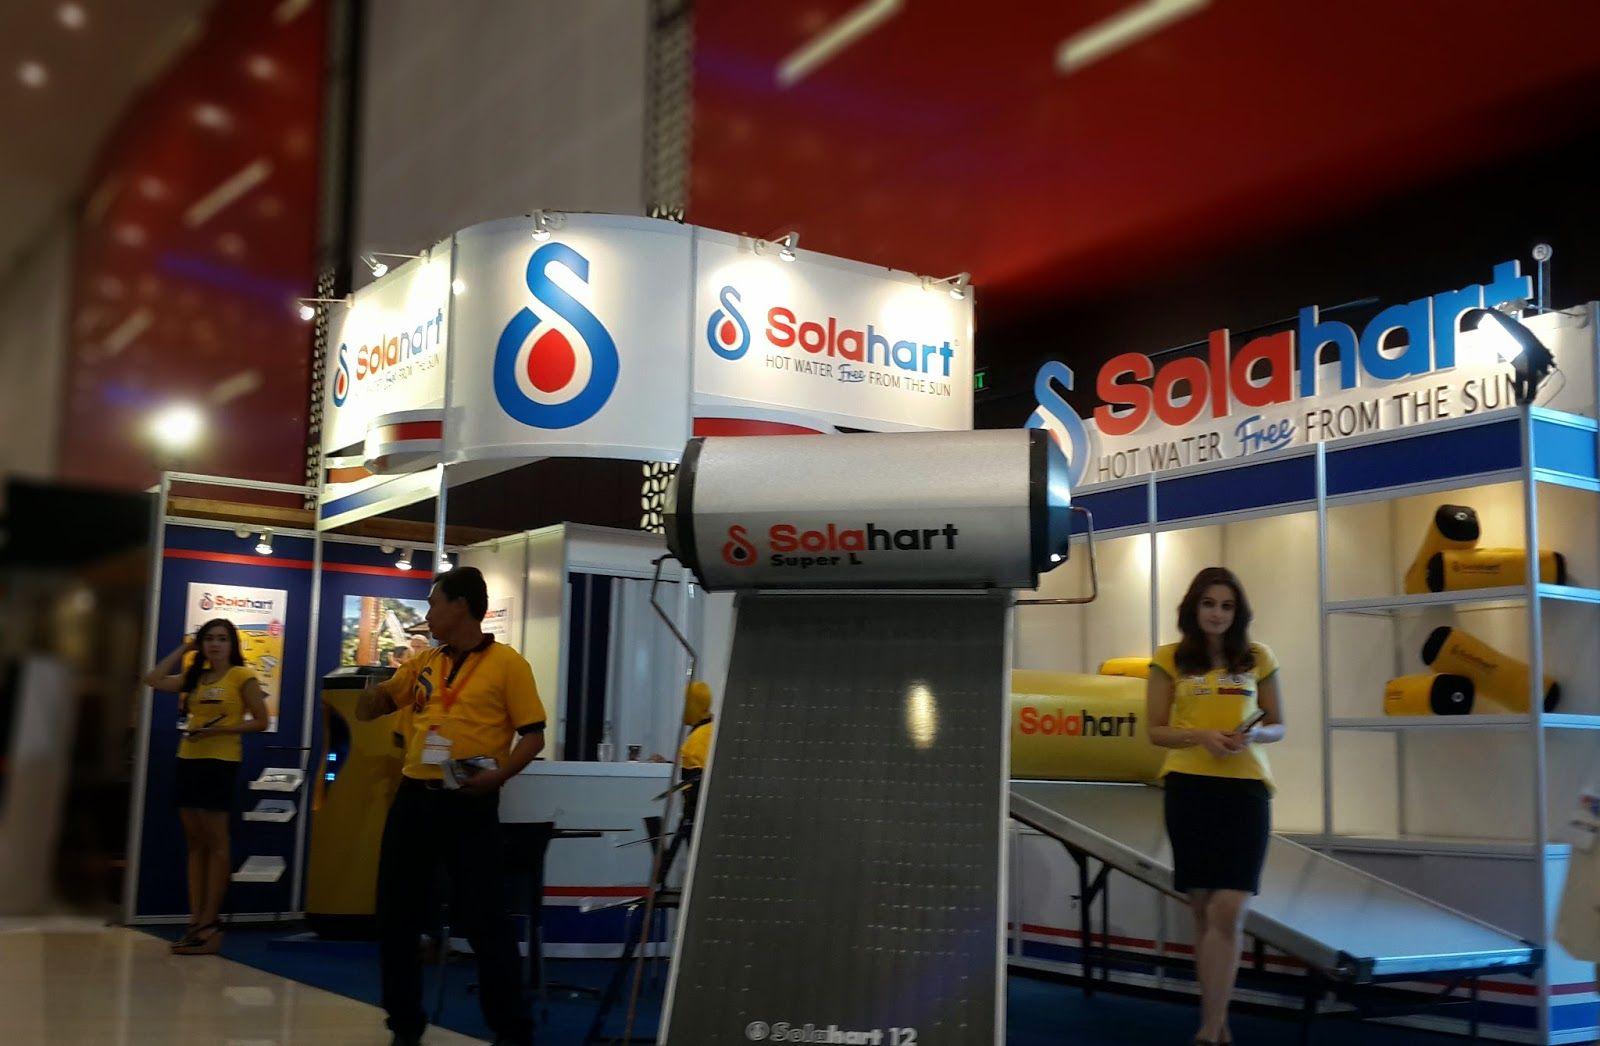 Service Pemanas Air Solahart, Wika, Edwards 081808044434